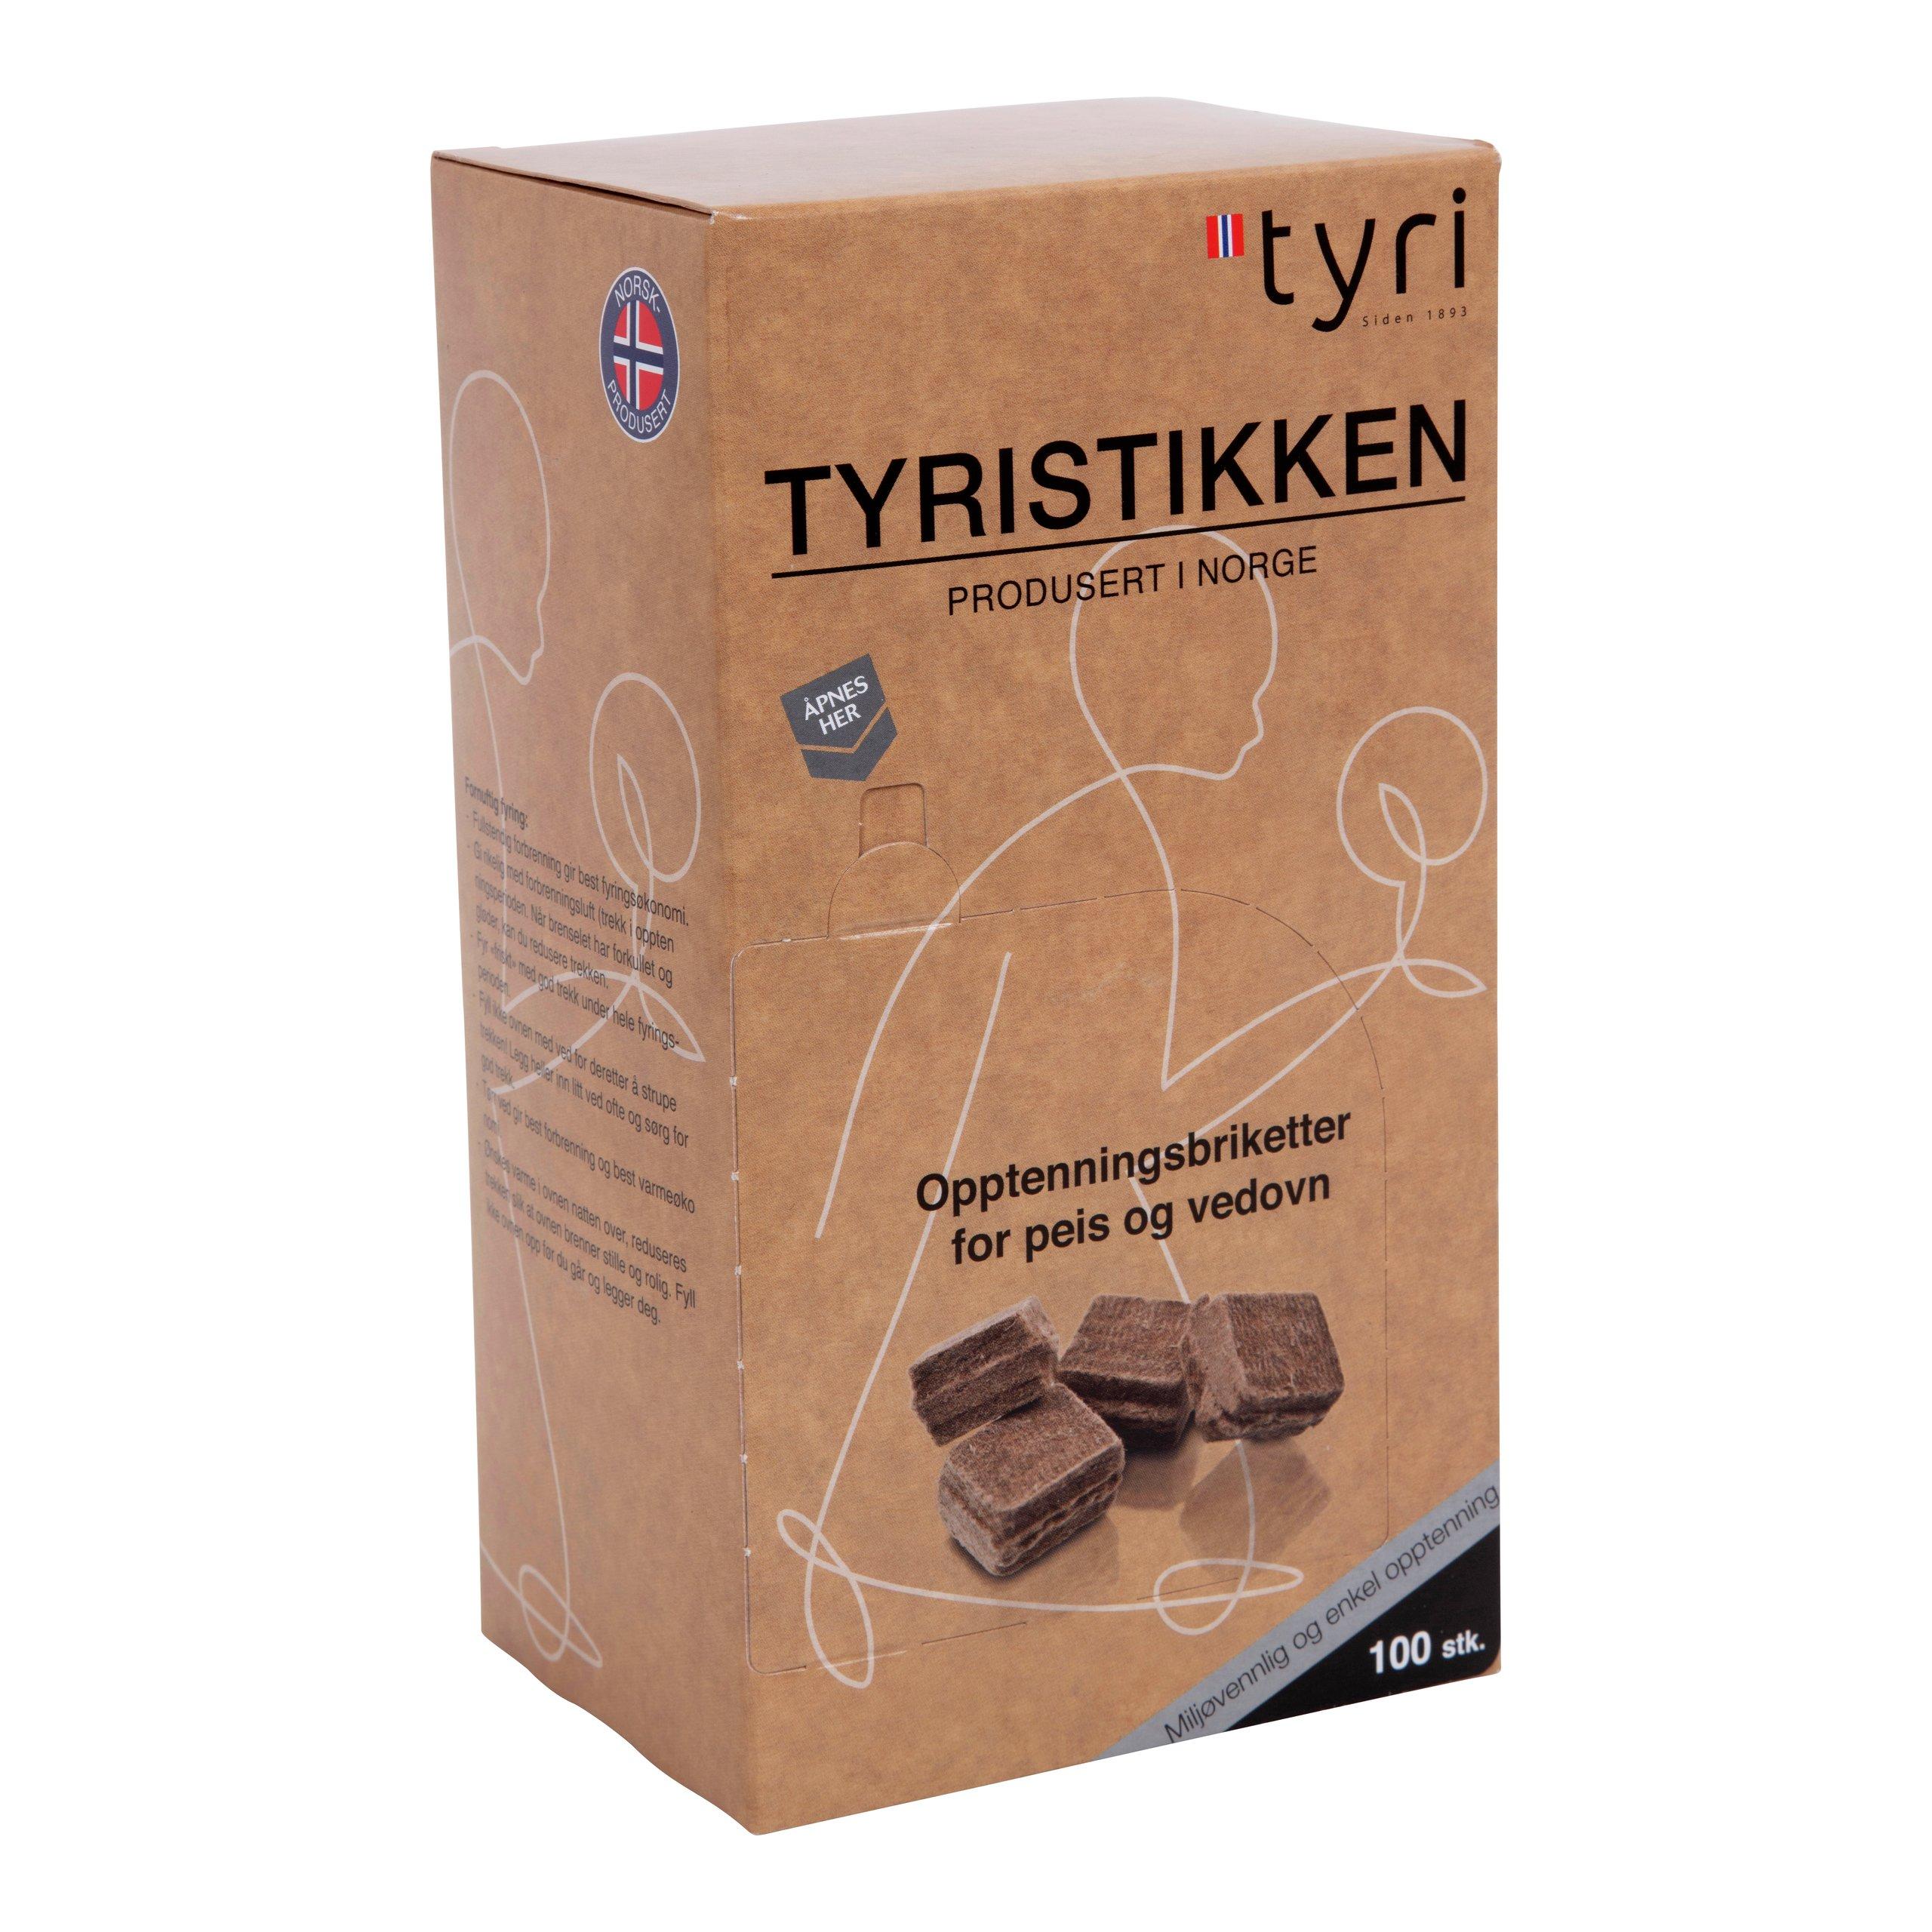 TENNBRIKETTER 100PK TYRISTIKKEN-103625